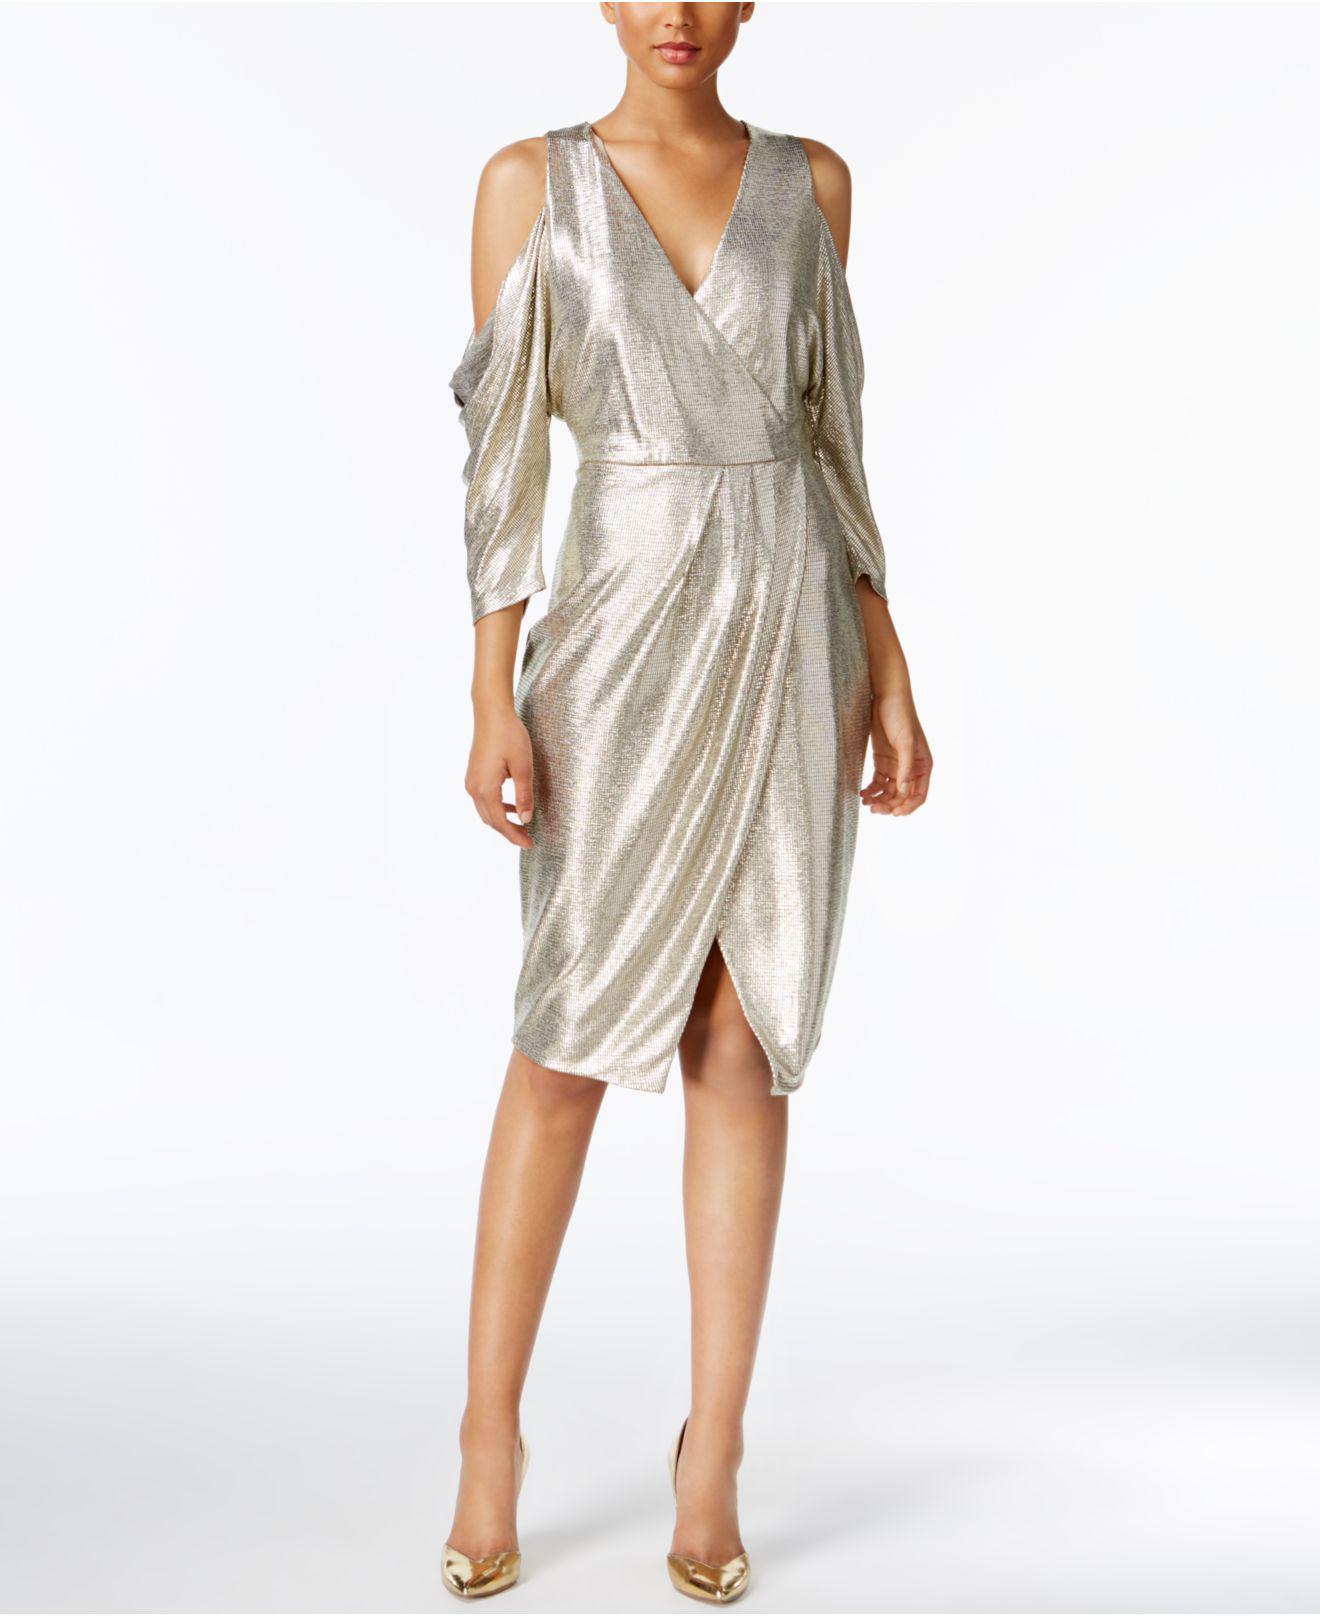 a298c13c230dd RACHEL Rachel Roy - Cold-shoulder Metallic Wrap Dress - Lyst. View  fullscreen